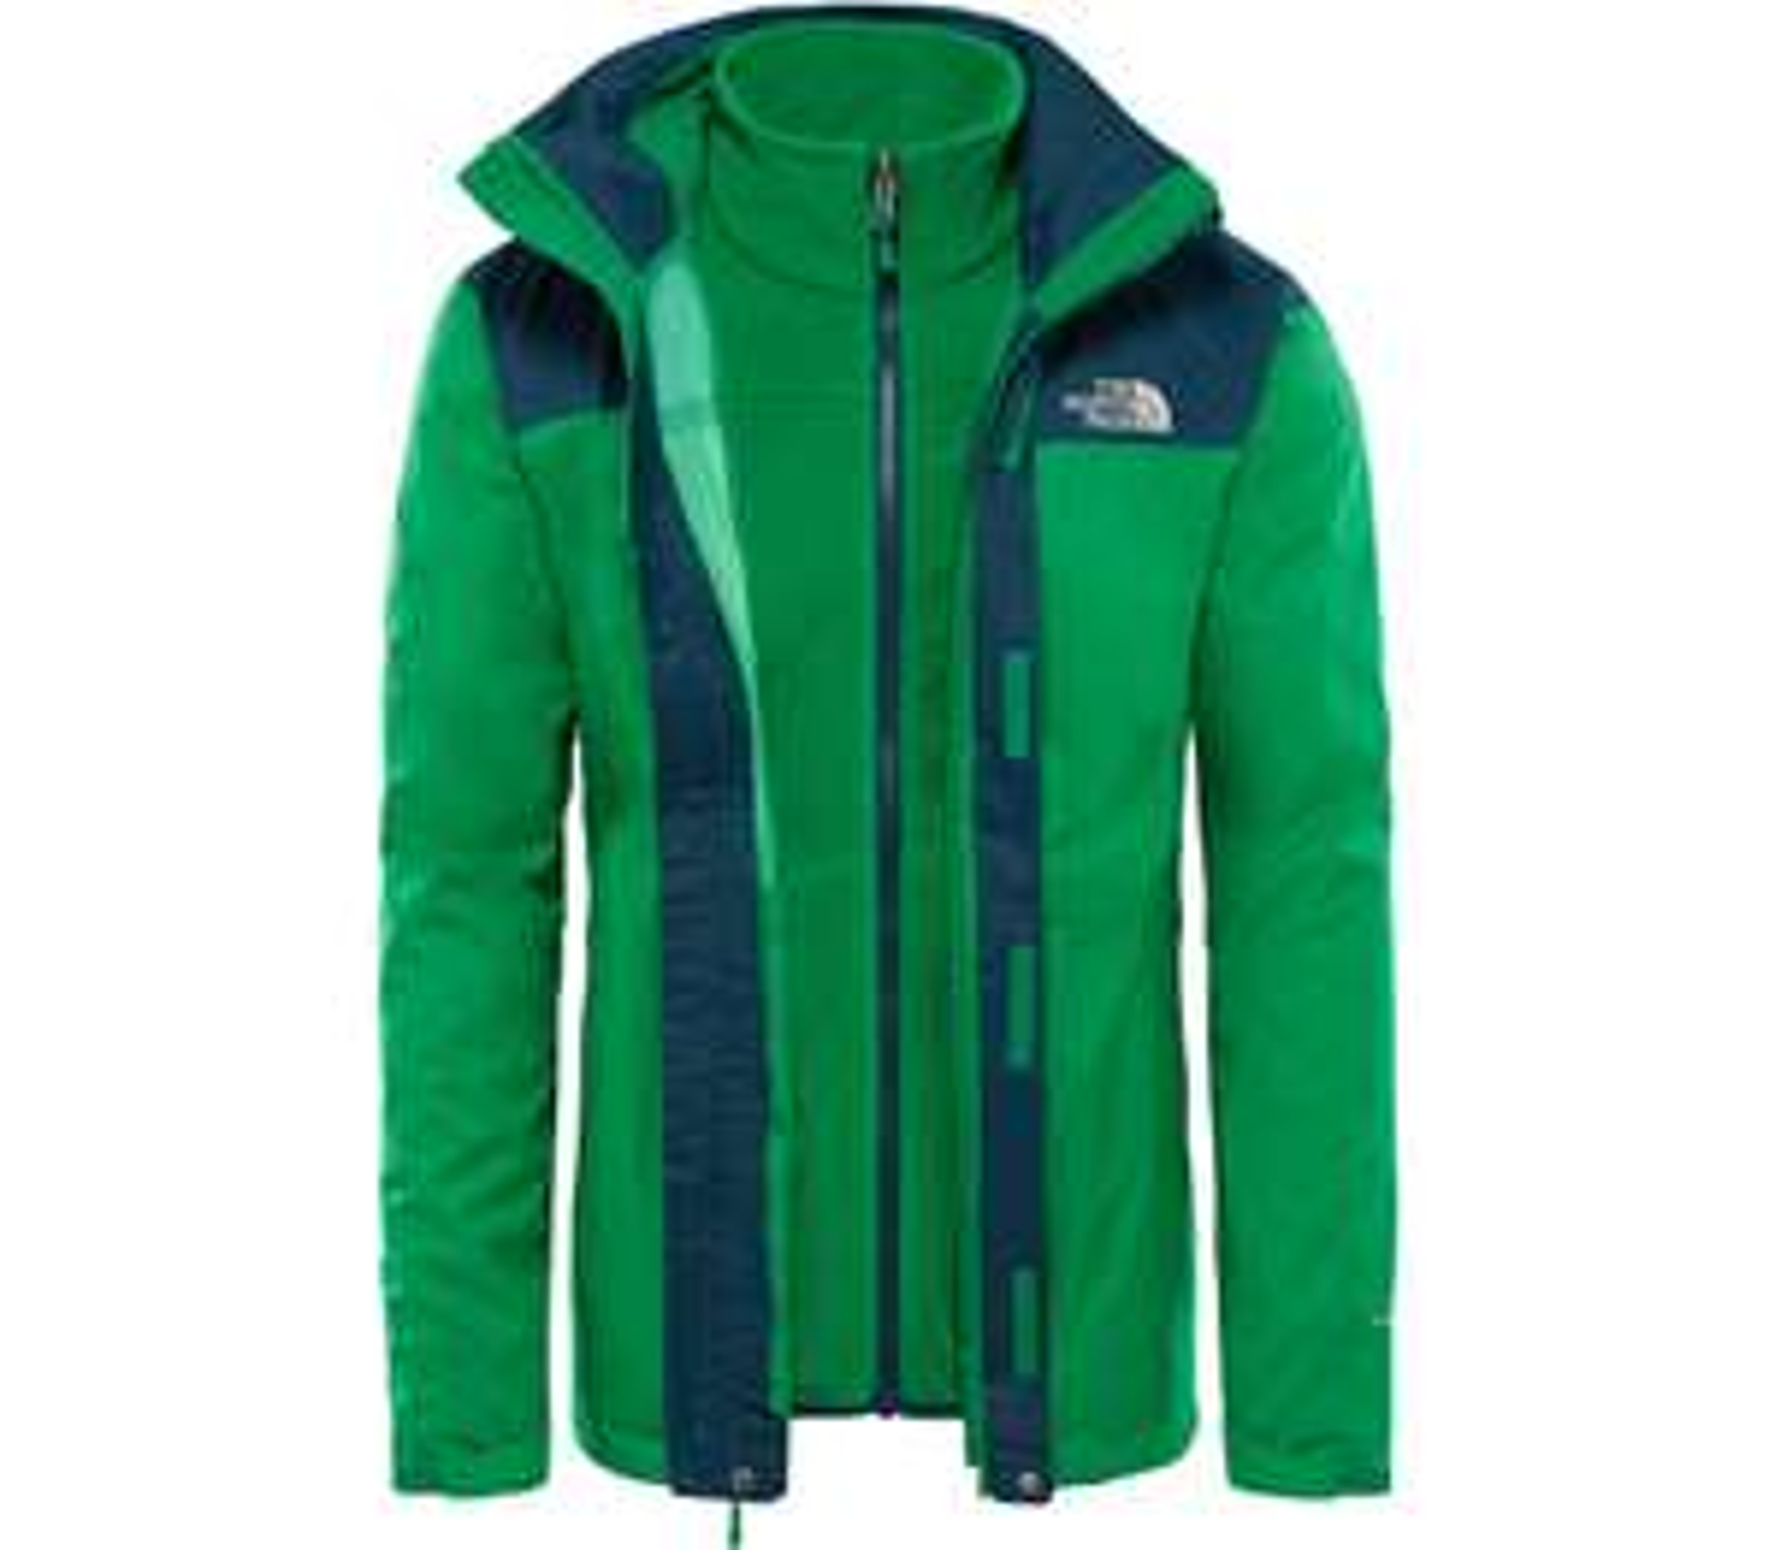 North Face Evolve ii Triclimate grün, nur in S